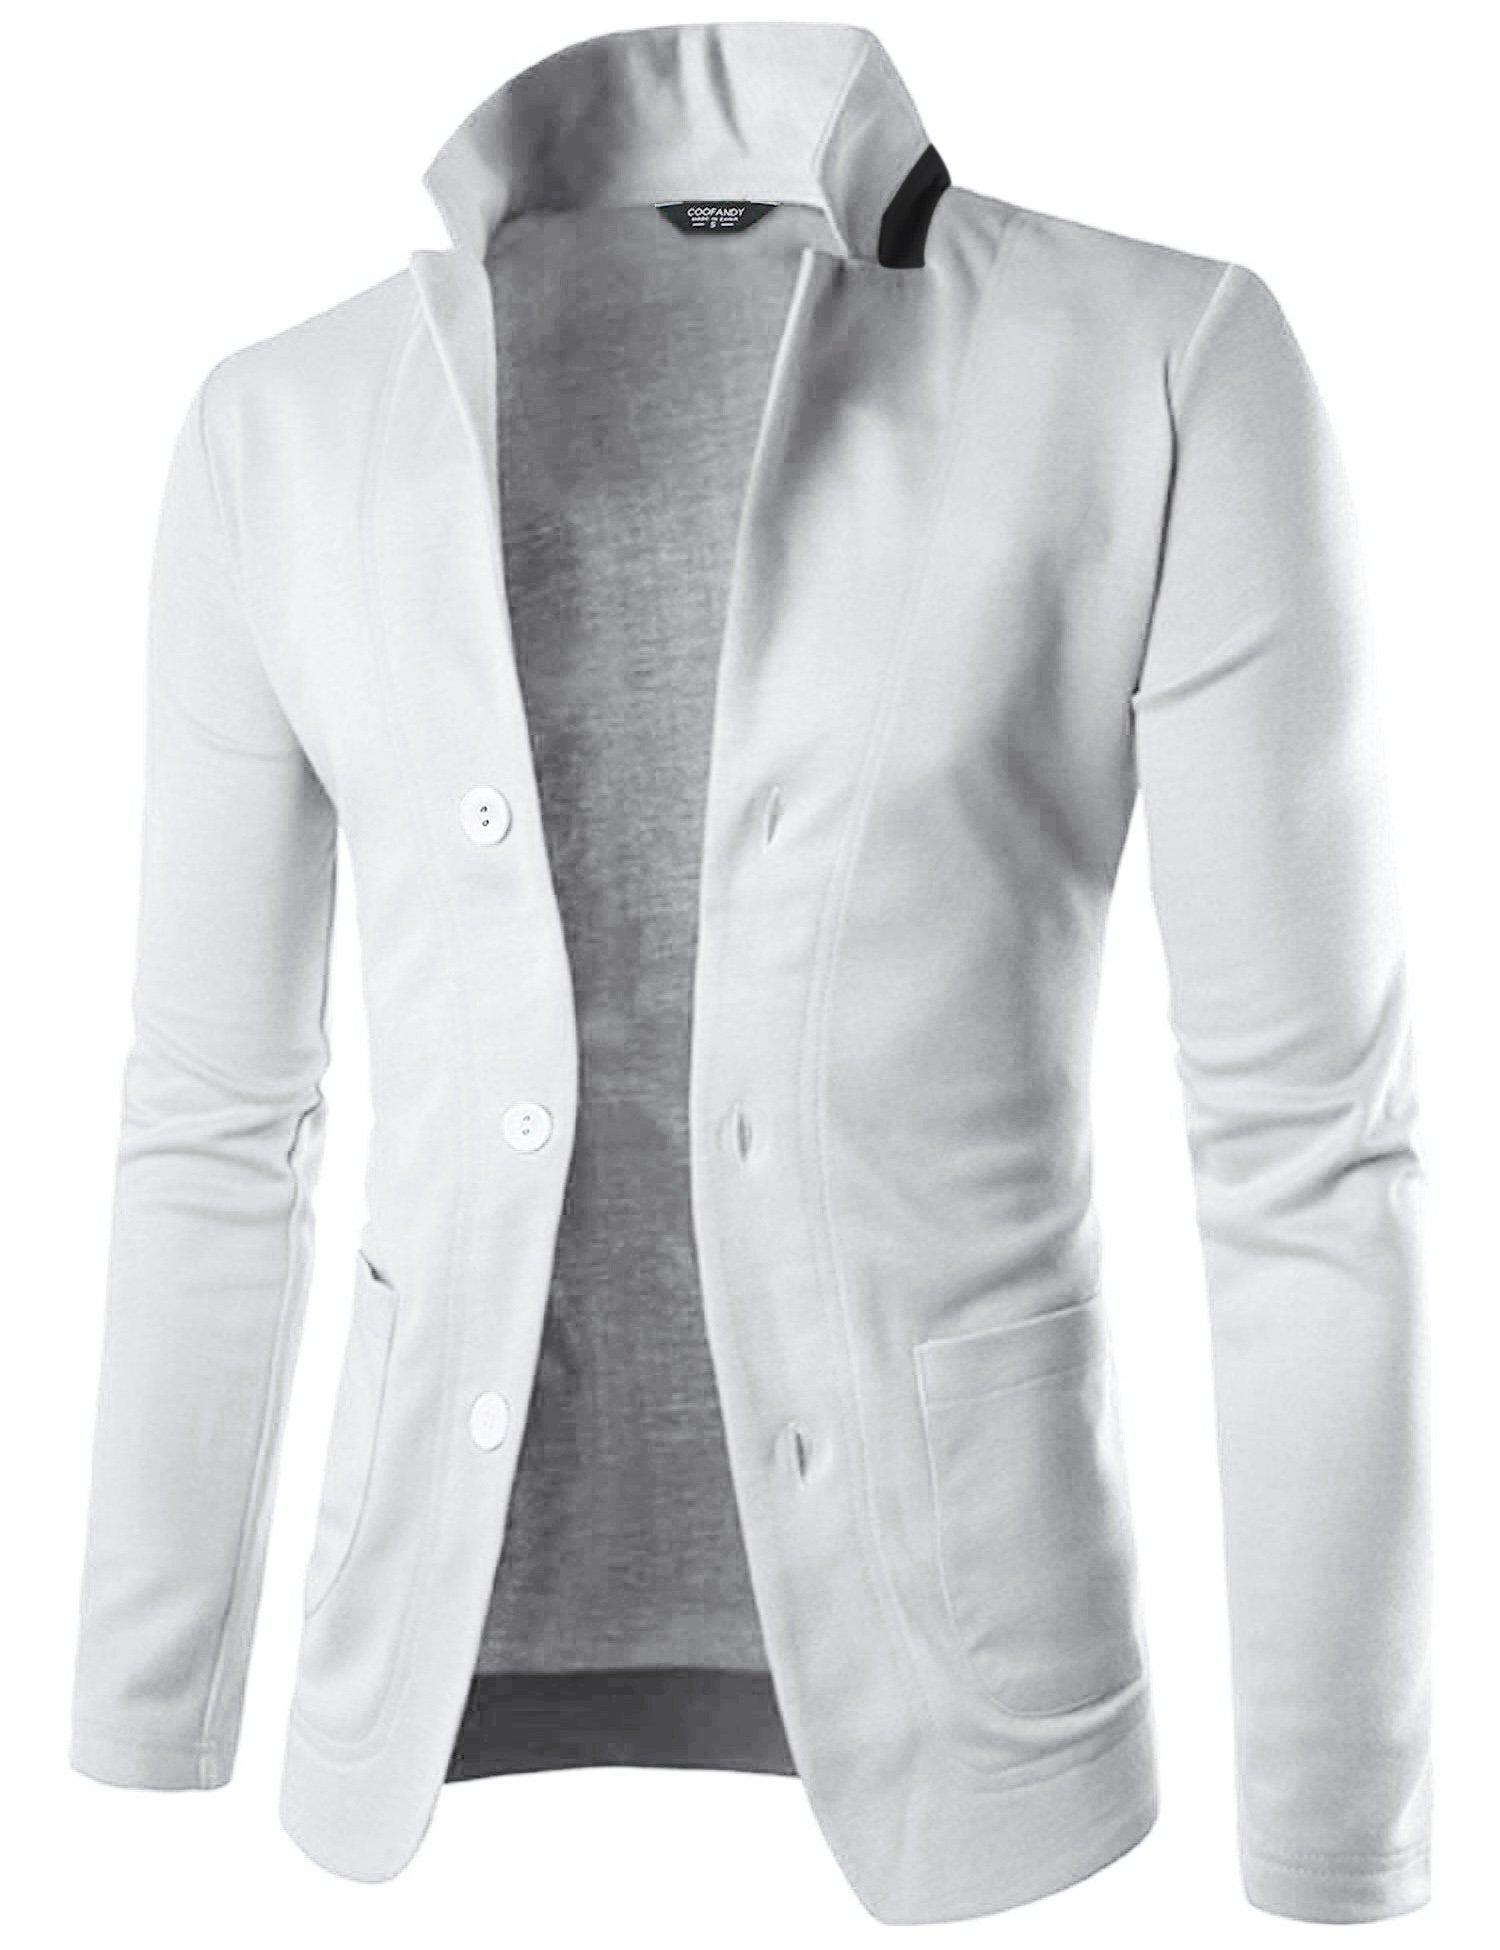 COOFANDY Mens Casual Slim Fit Blazer 3 Button Suit Sport Coat Lightweight Jacket,White,Medium